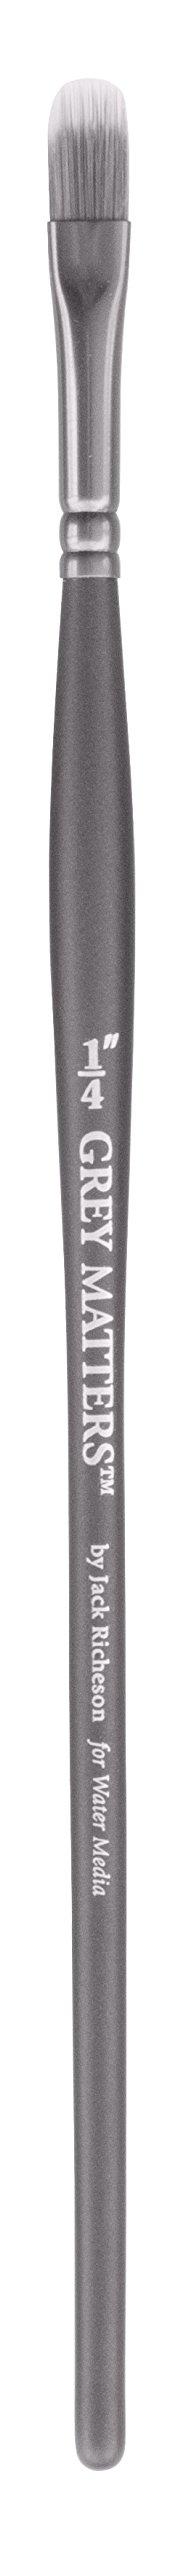 Jack Richeson Richeson Grey Matters Synthetic Filbert Rake 1/4'' by Jack Richeson